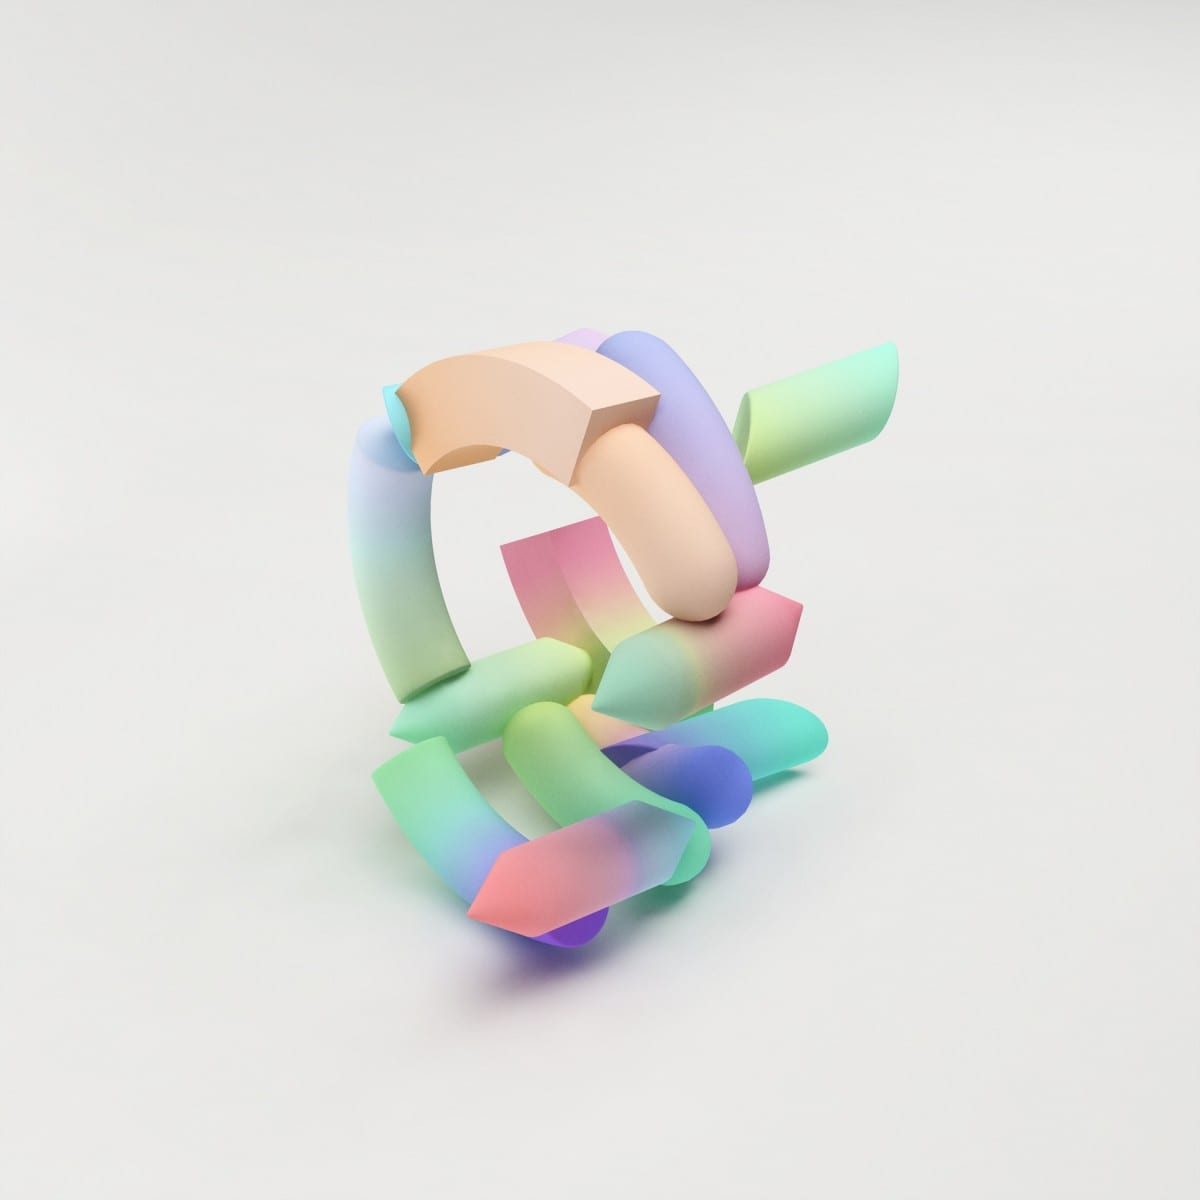 Maiko Gubler, Gradient Bangles, Limited Endless Edition No. 07, digital model/ dimensions variable, 2013